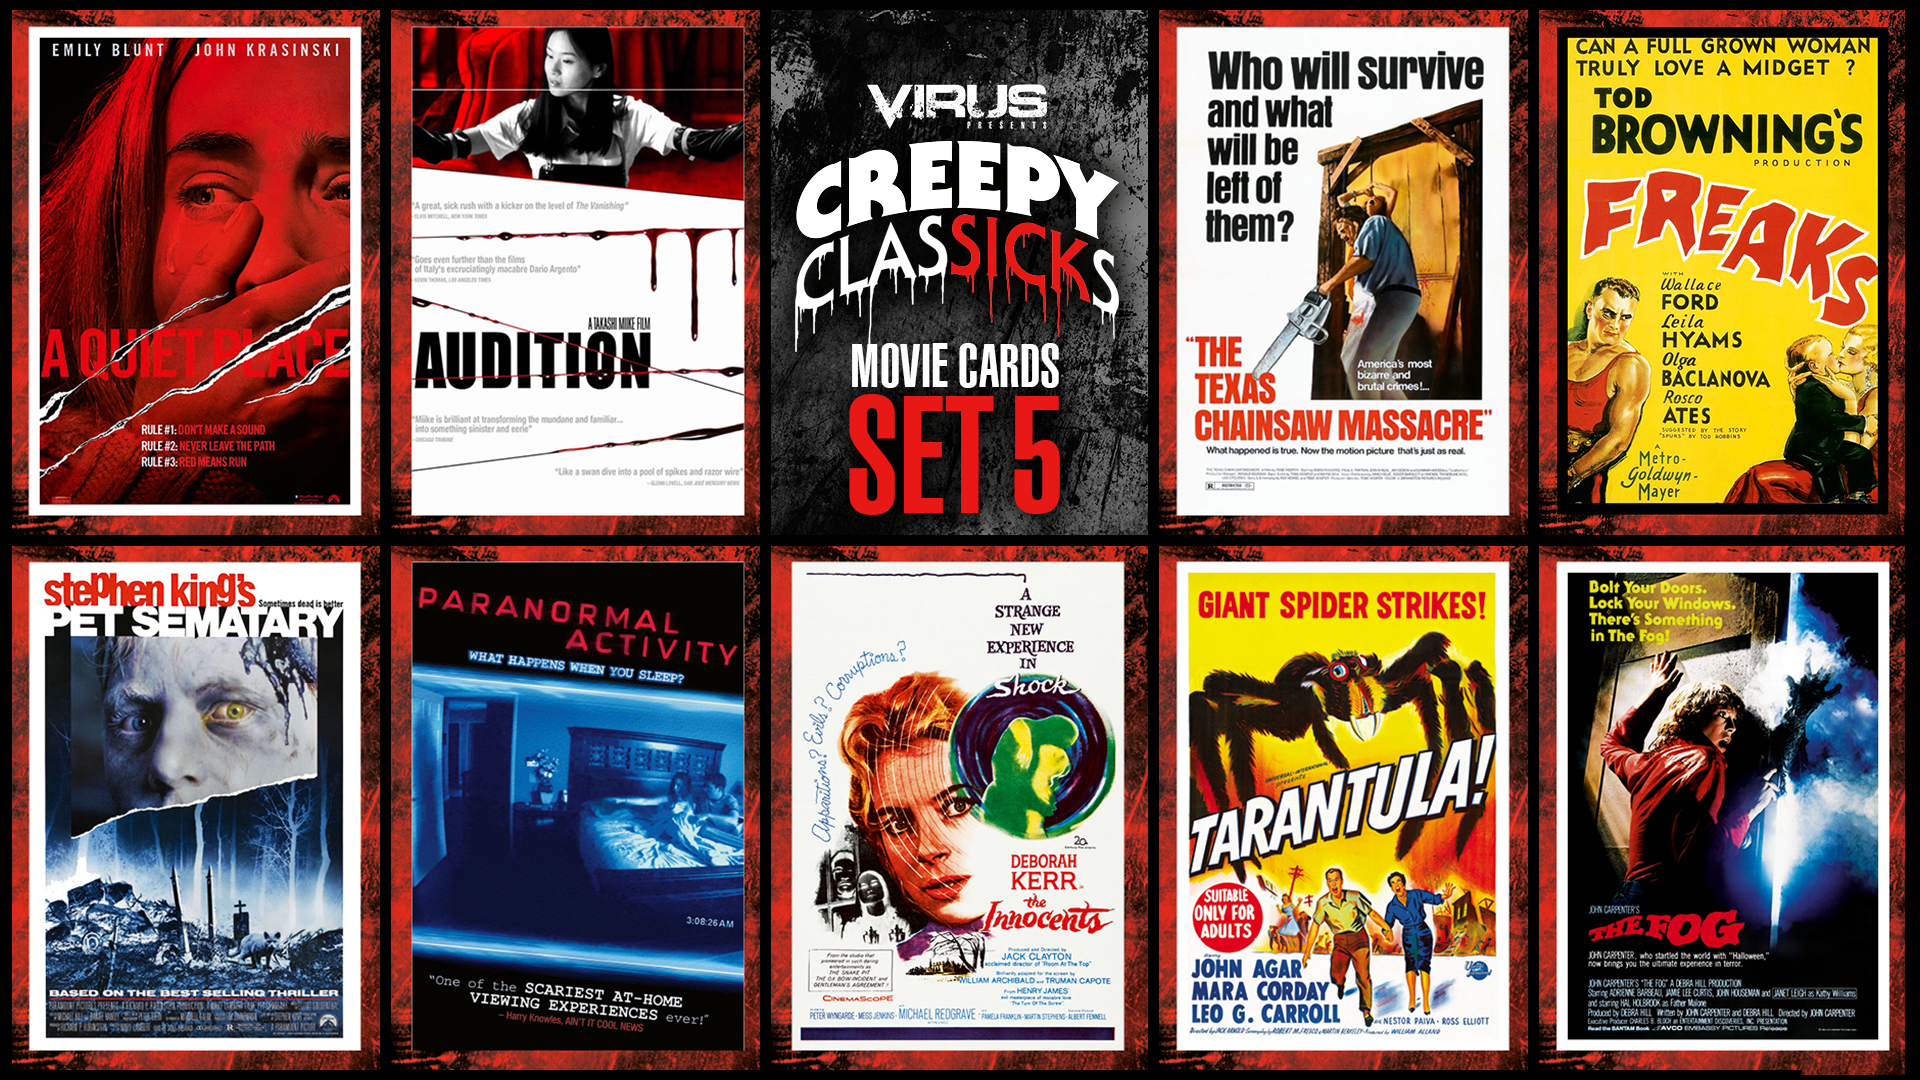 VIRUS Creepy ClasSICKs Movie Cards Set #05